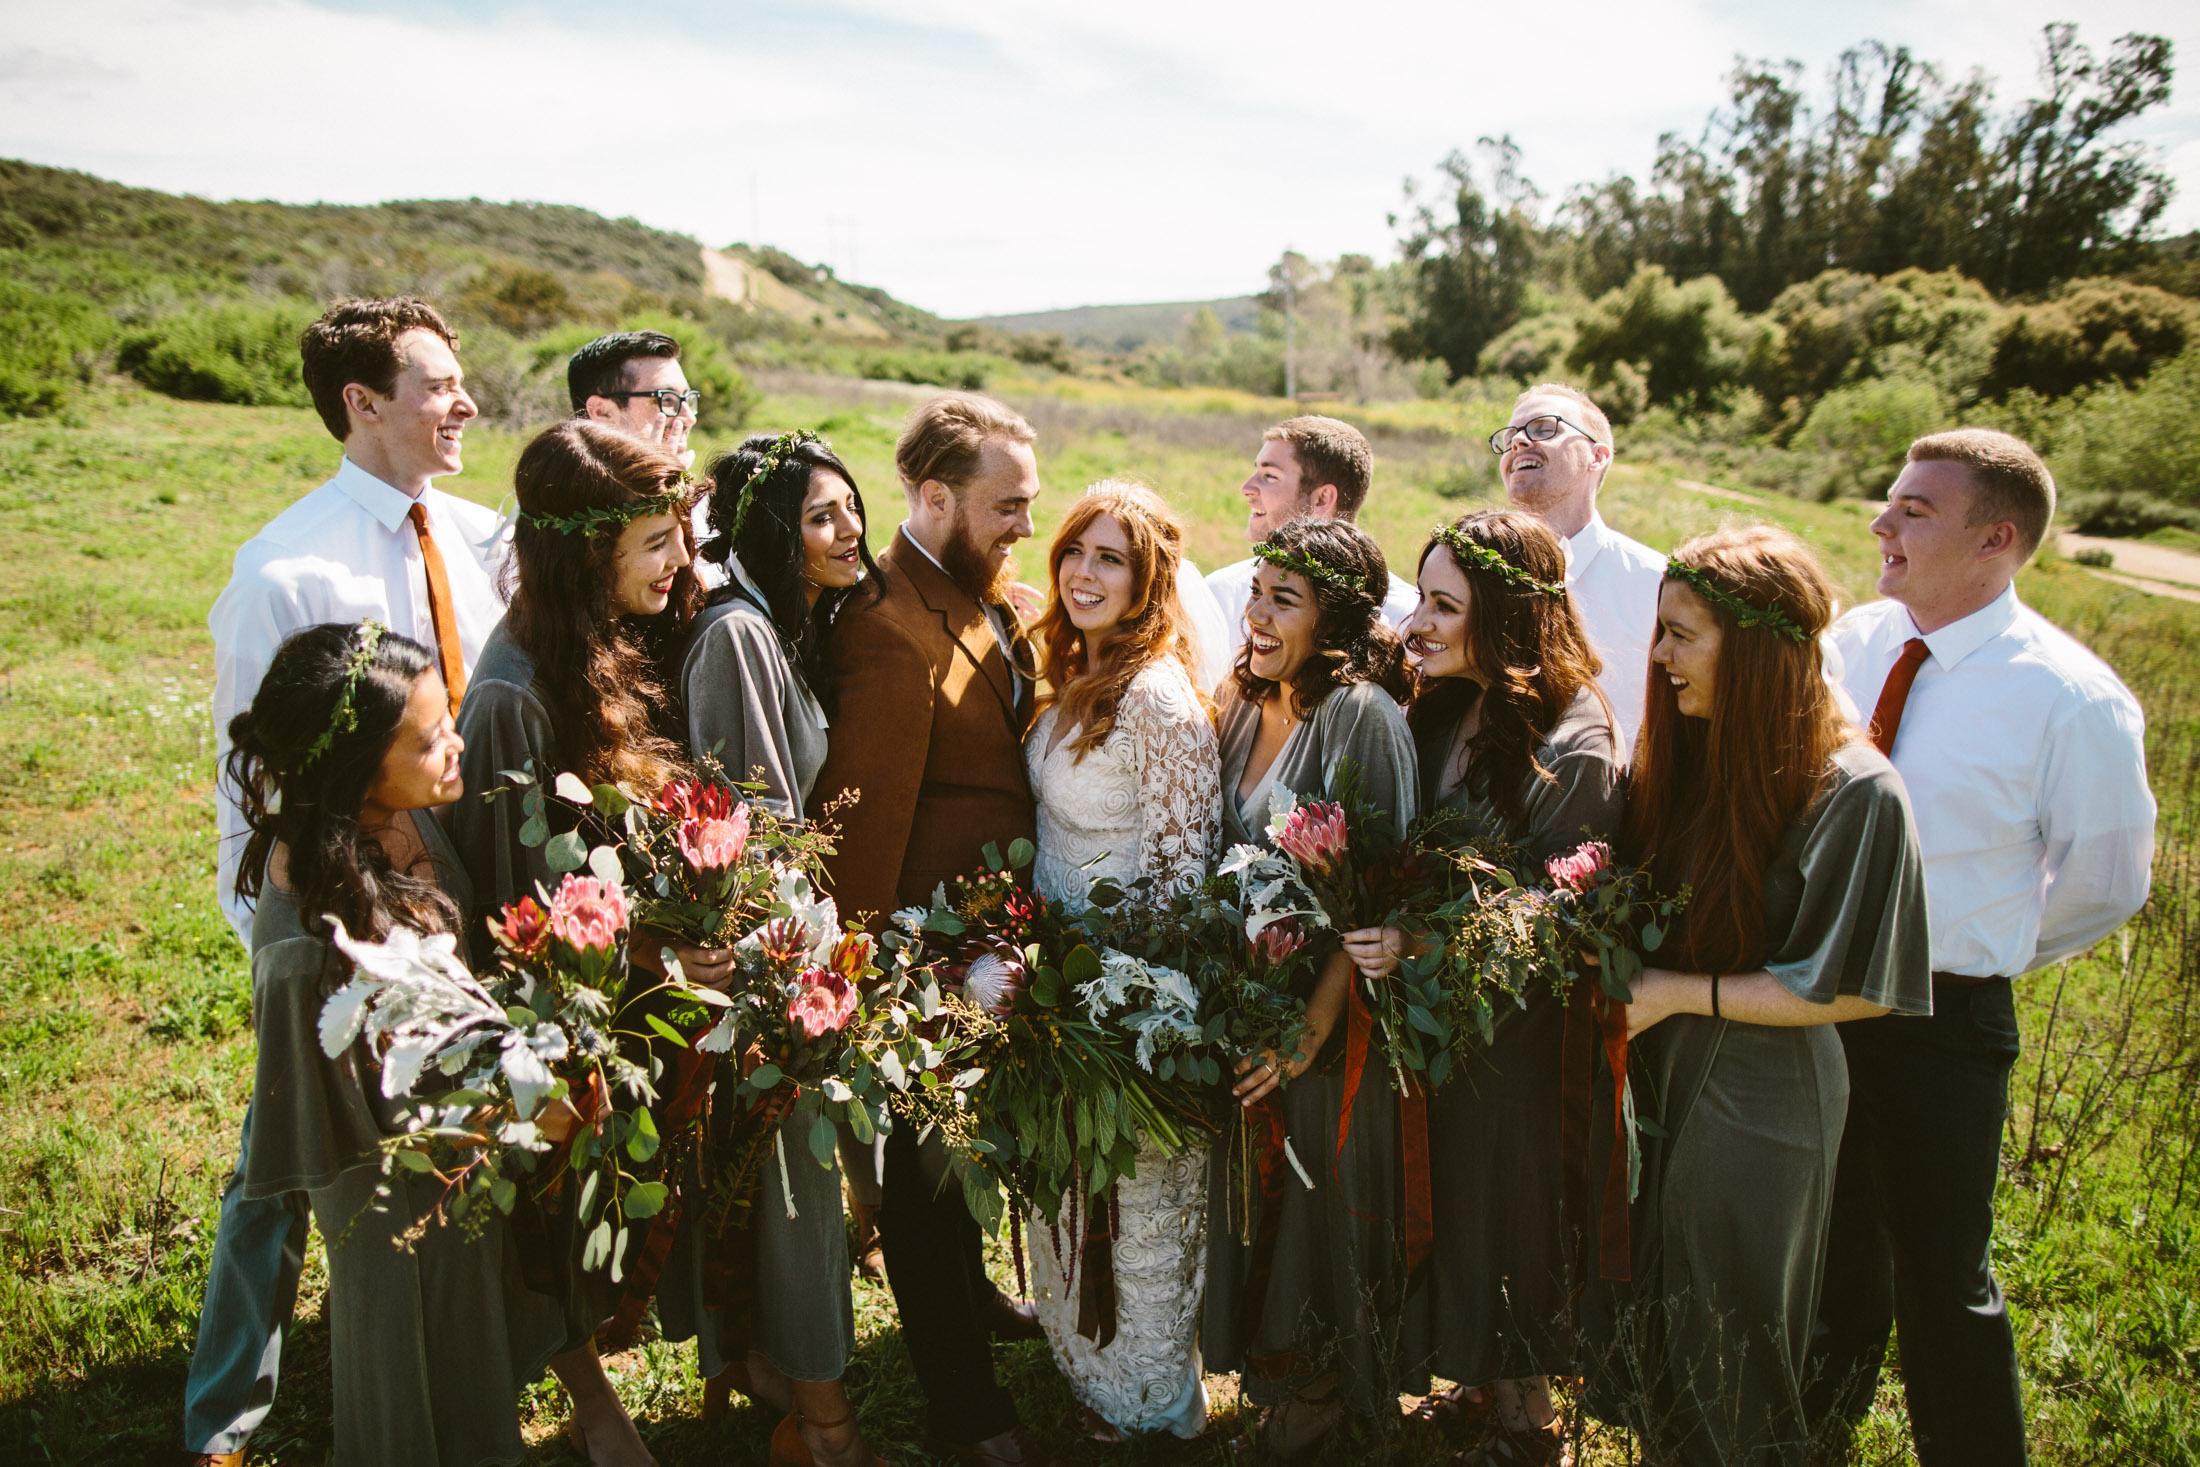 The-woodshed-booze-brothers-venue-wedding-20.jpg